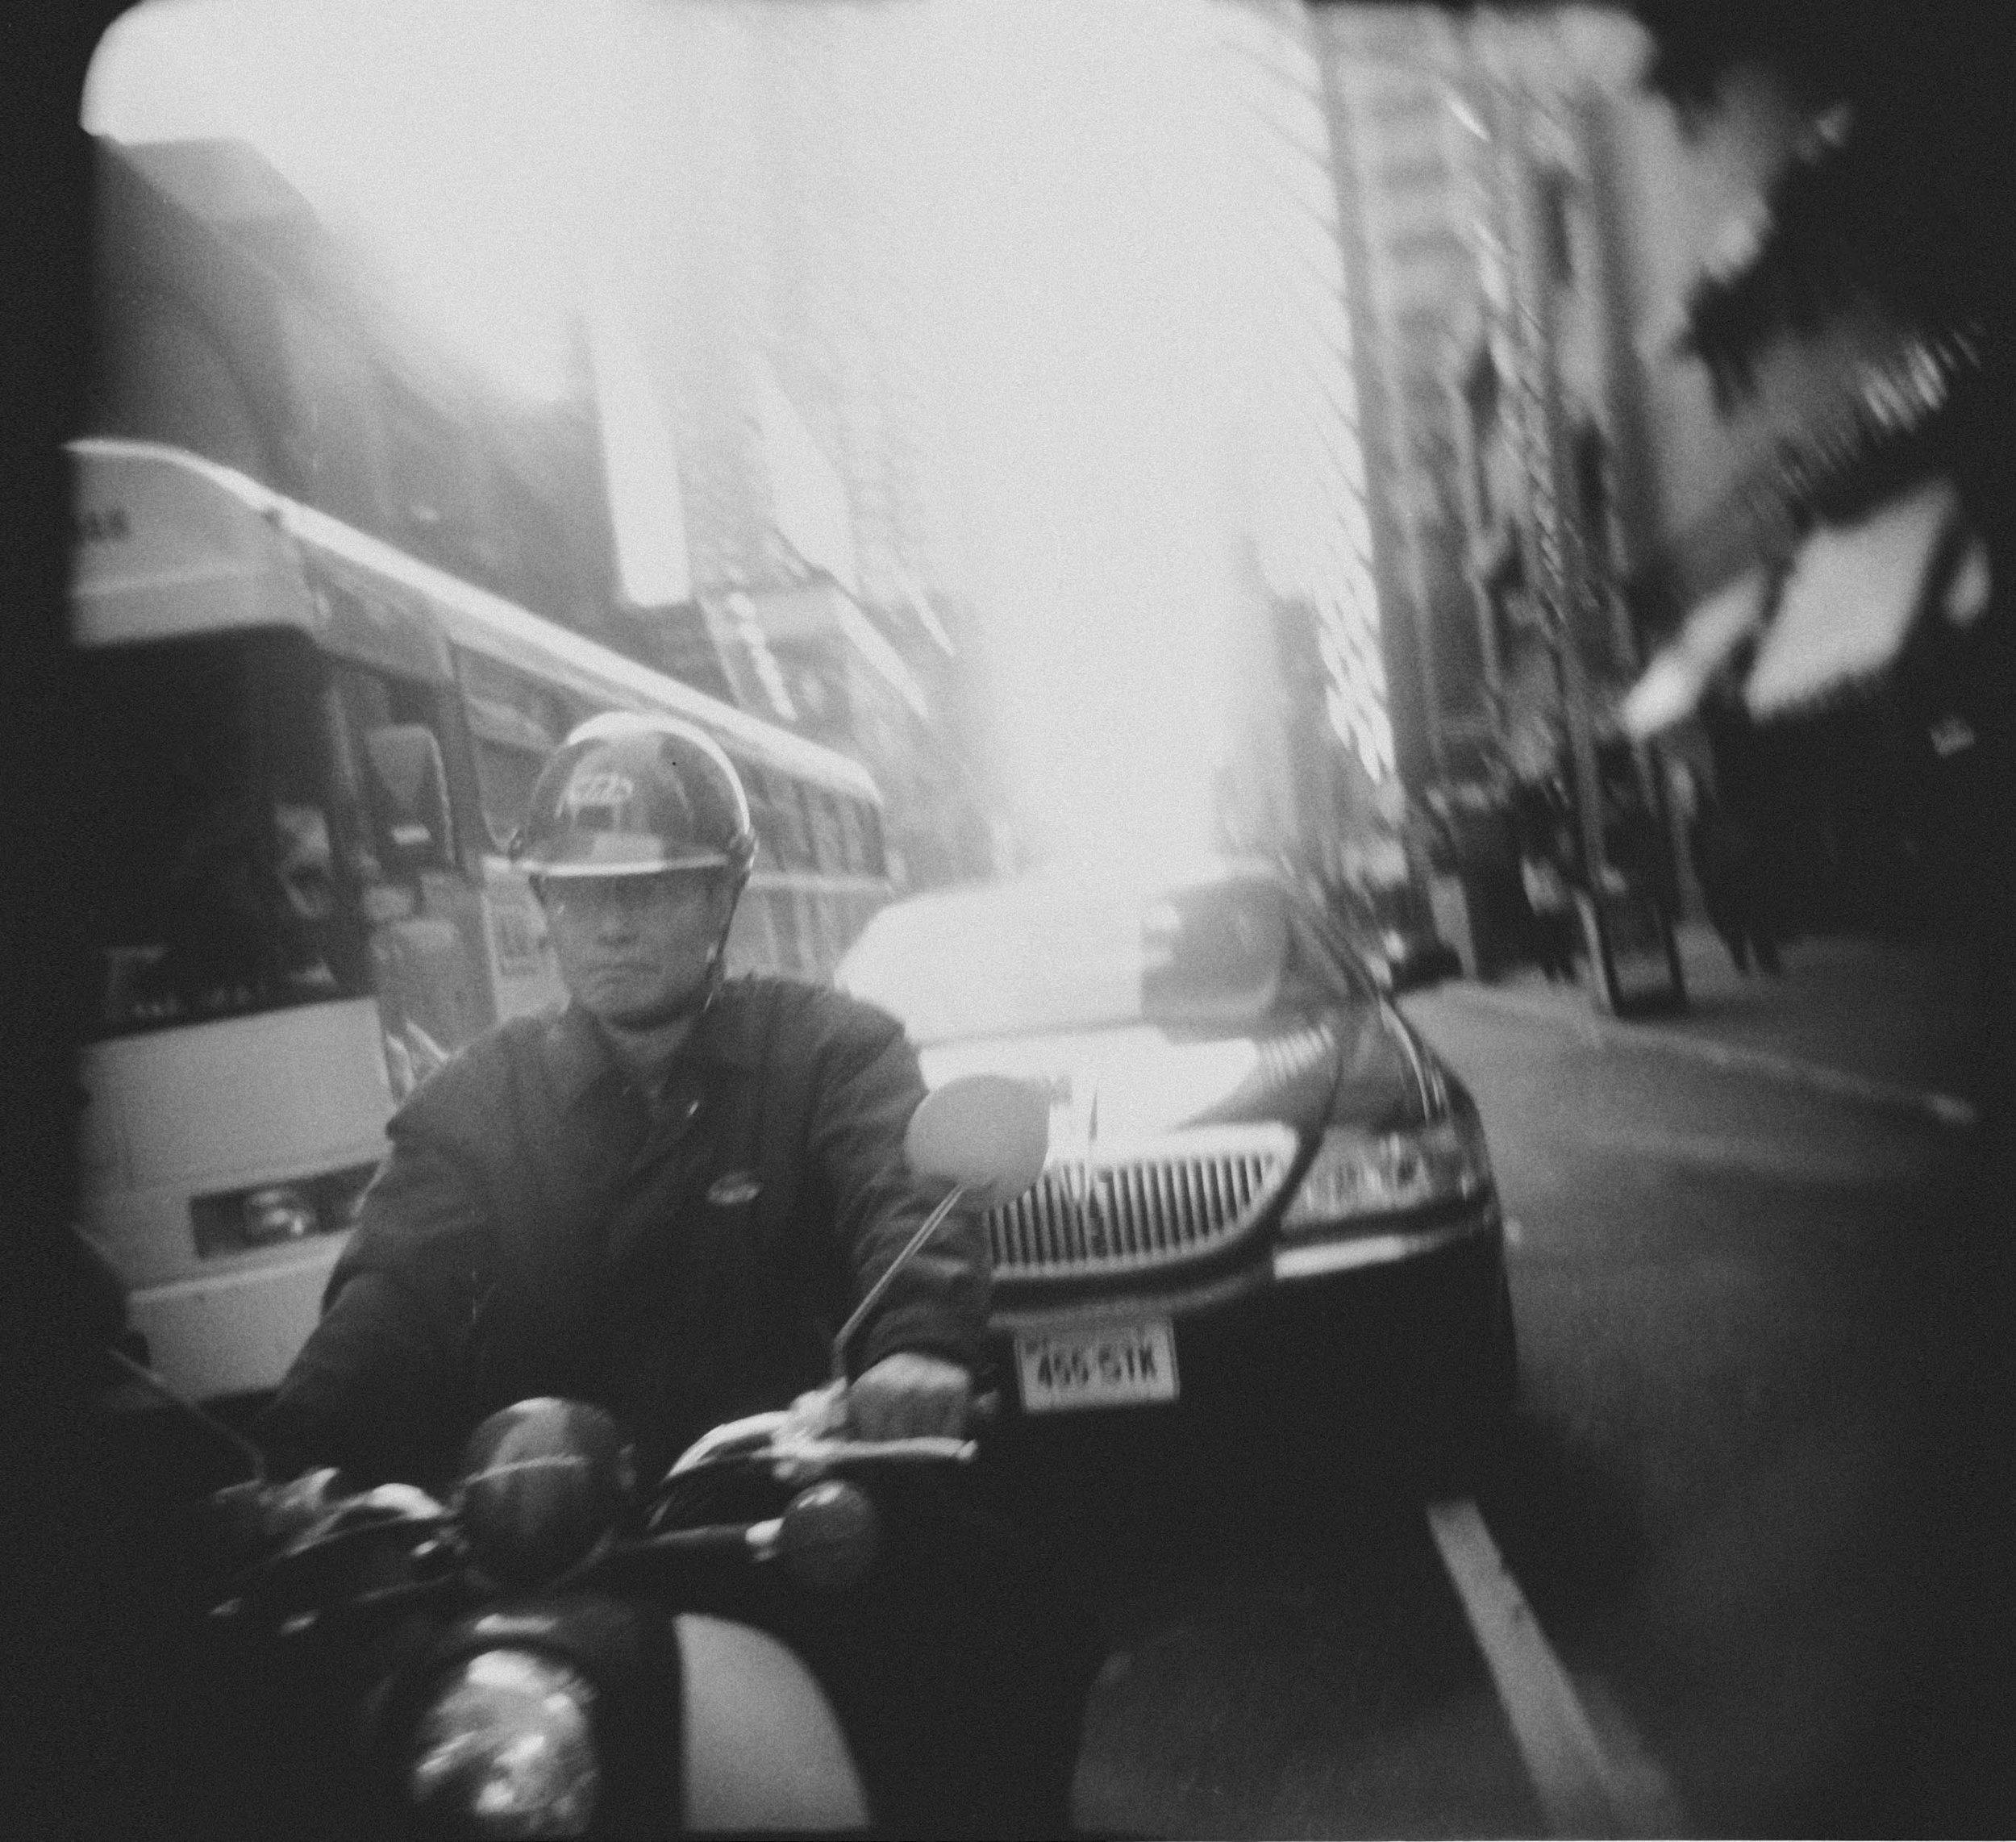 shane_deruise_alleyways_man_moped_holga.jpg